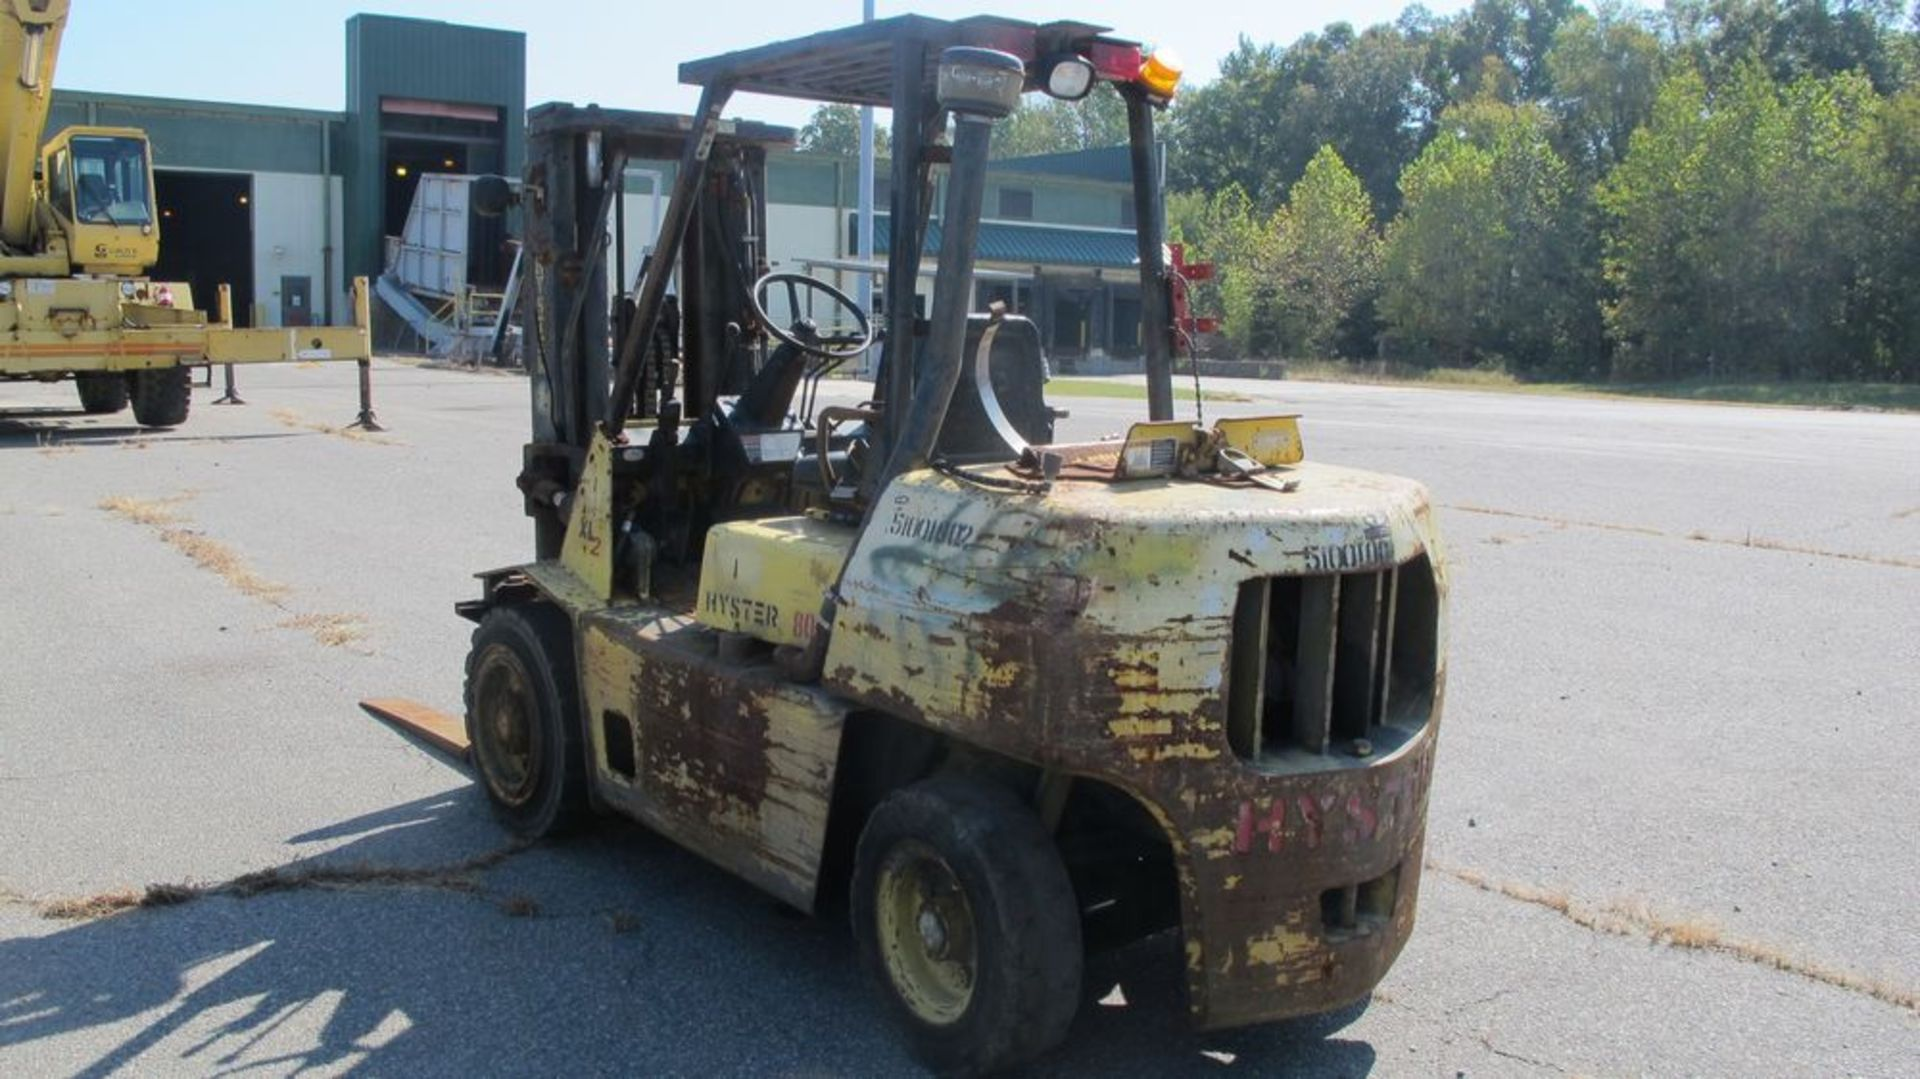 Lot 20 - HYSTER H80XL PROPANE FORK TRUCK (NEEDS REPAIR), 5000 LB CAP (NO PROPANE TANK), S/N G005D13026V (